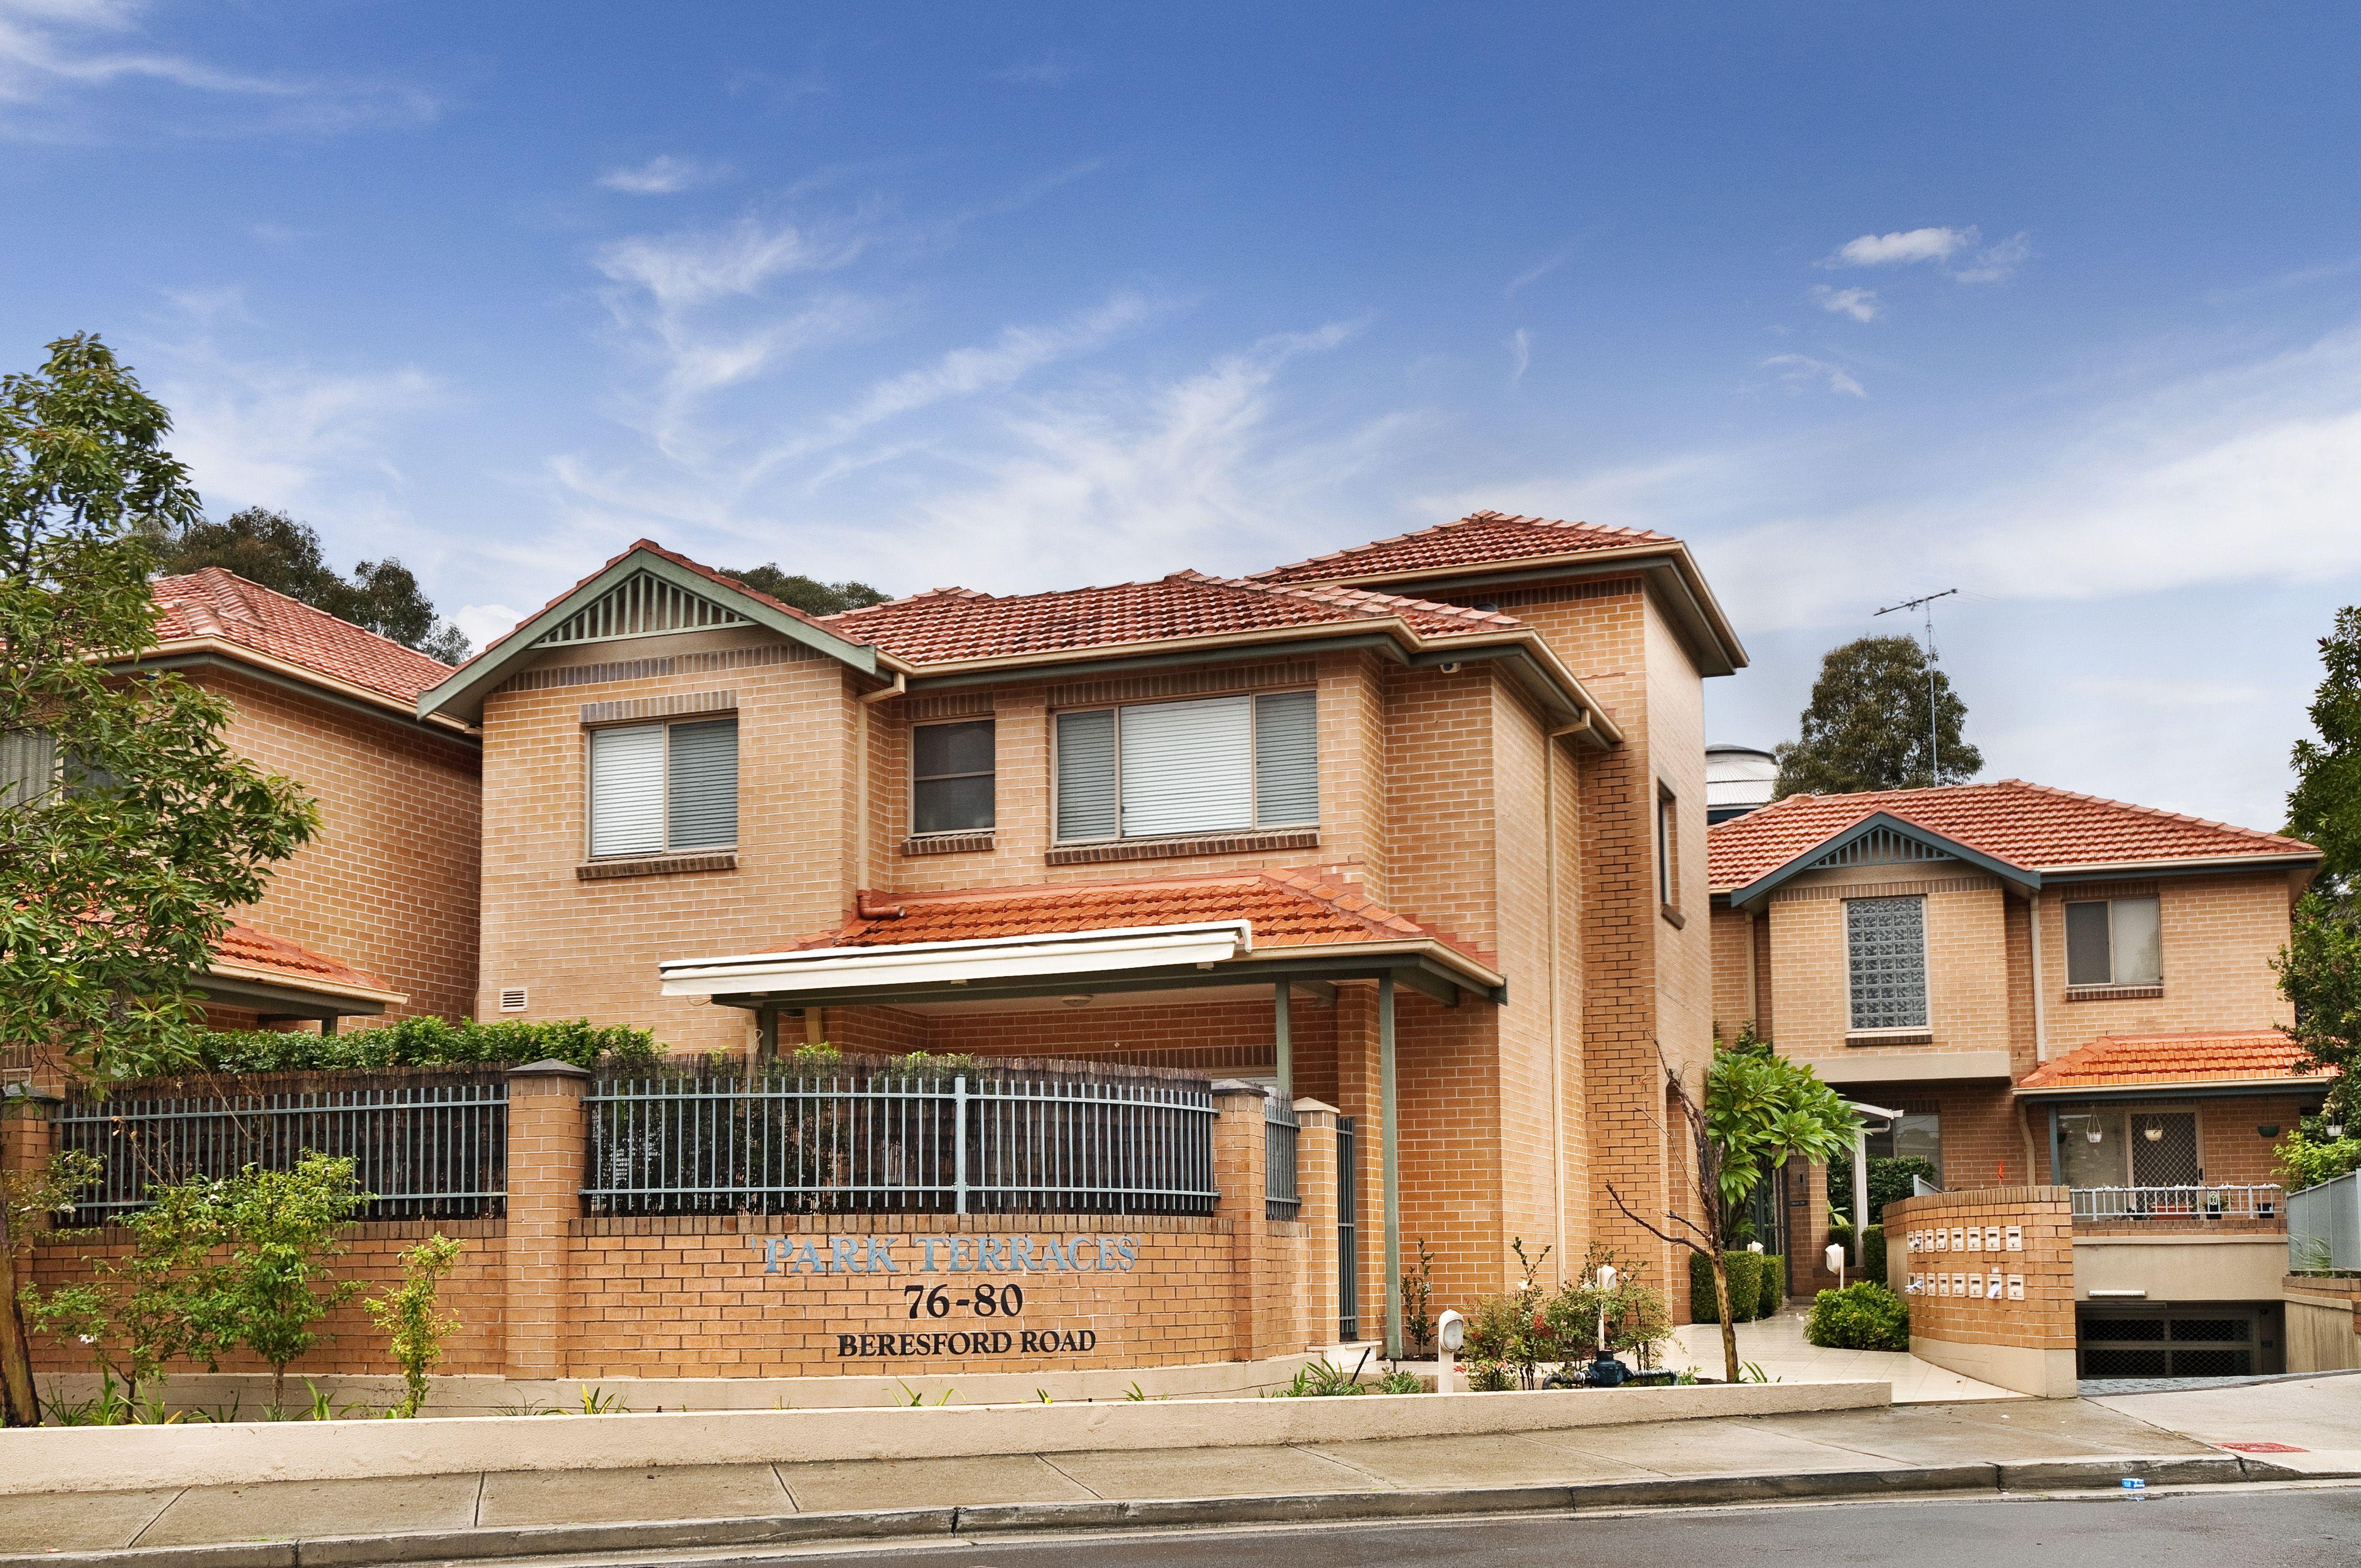 6/76-80 Beresford Road, Strathfield NSW 2135